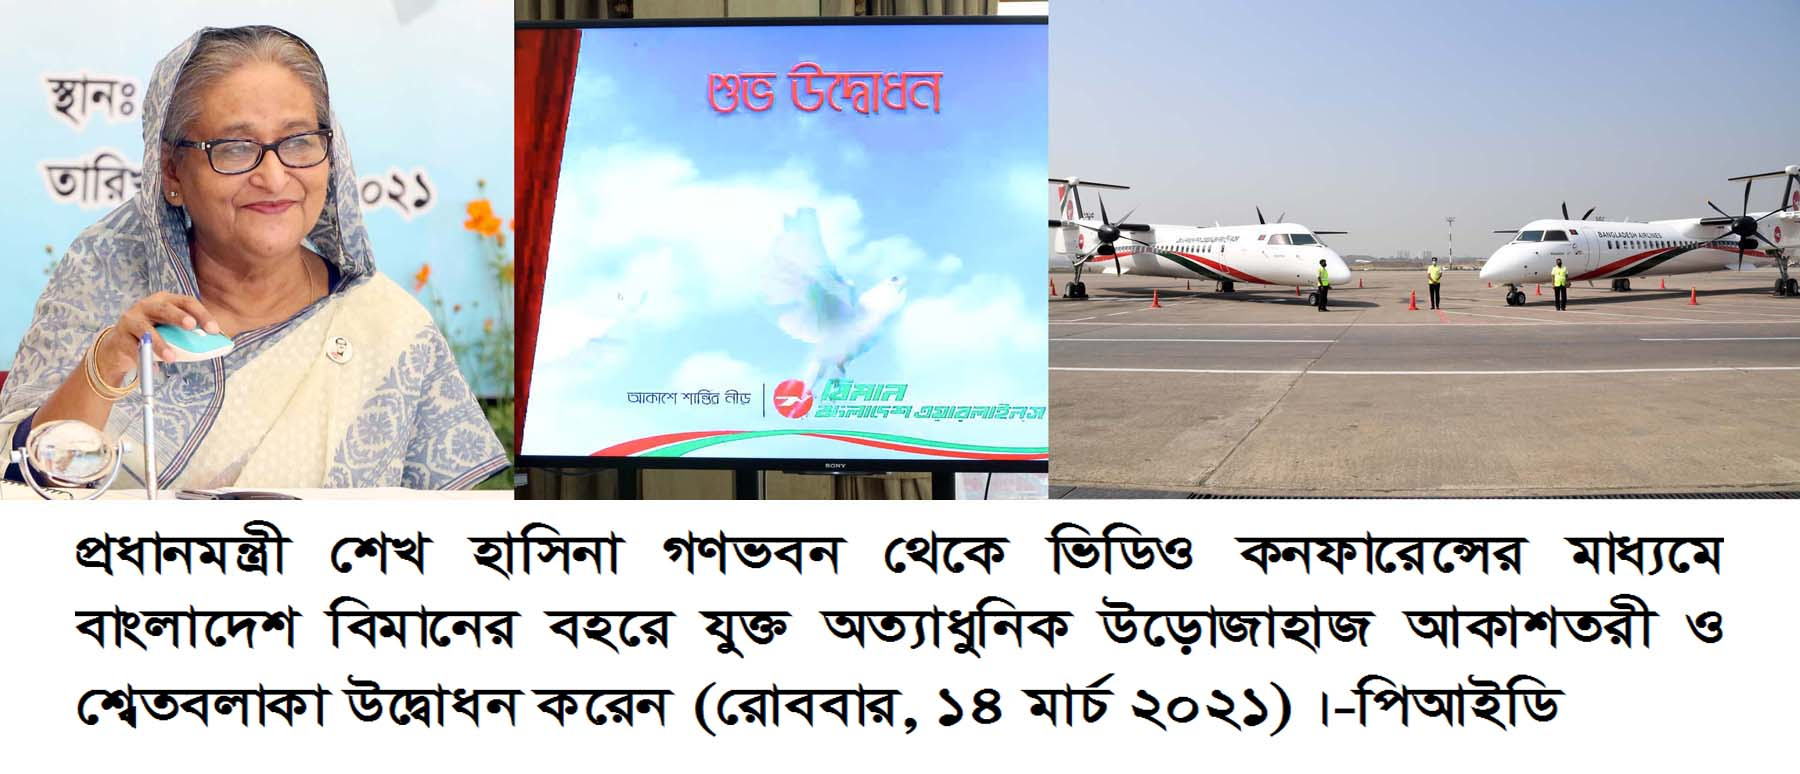 Sheikh Hasina joins Bangladesh Biman event